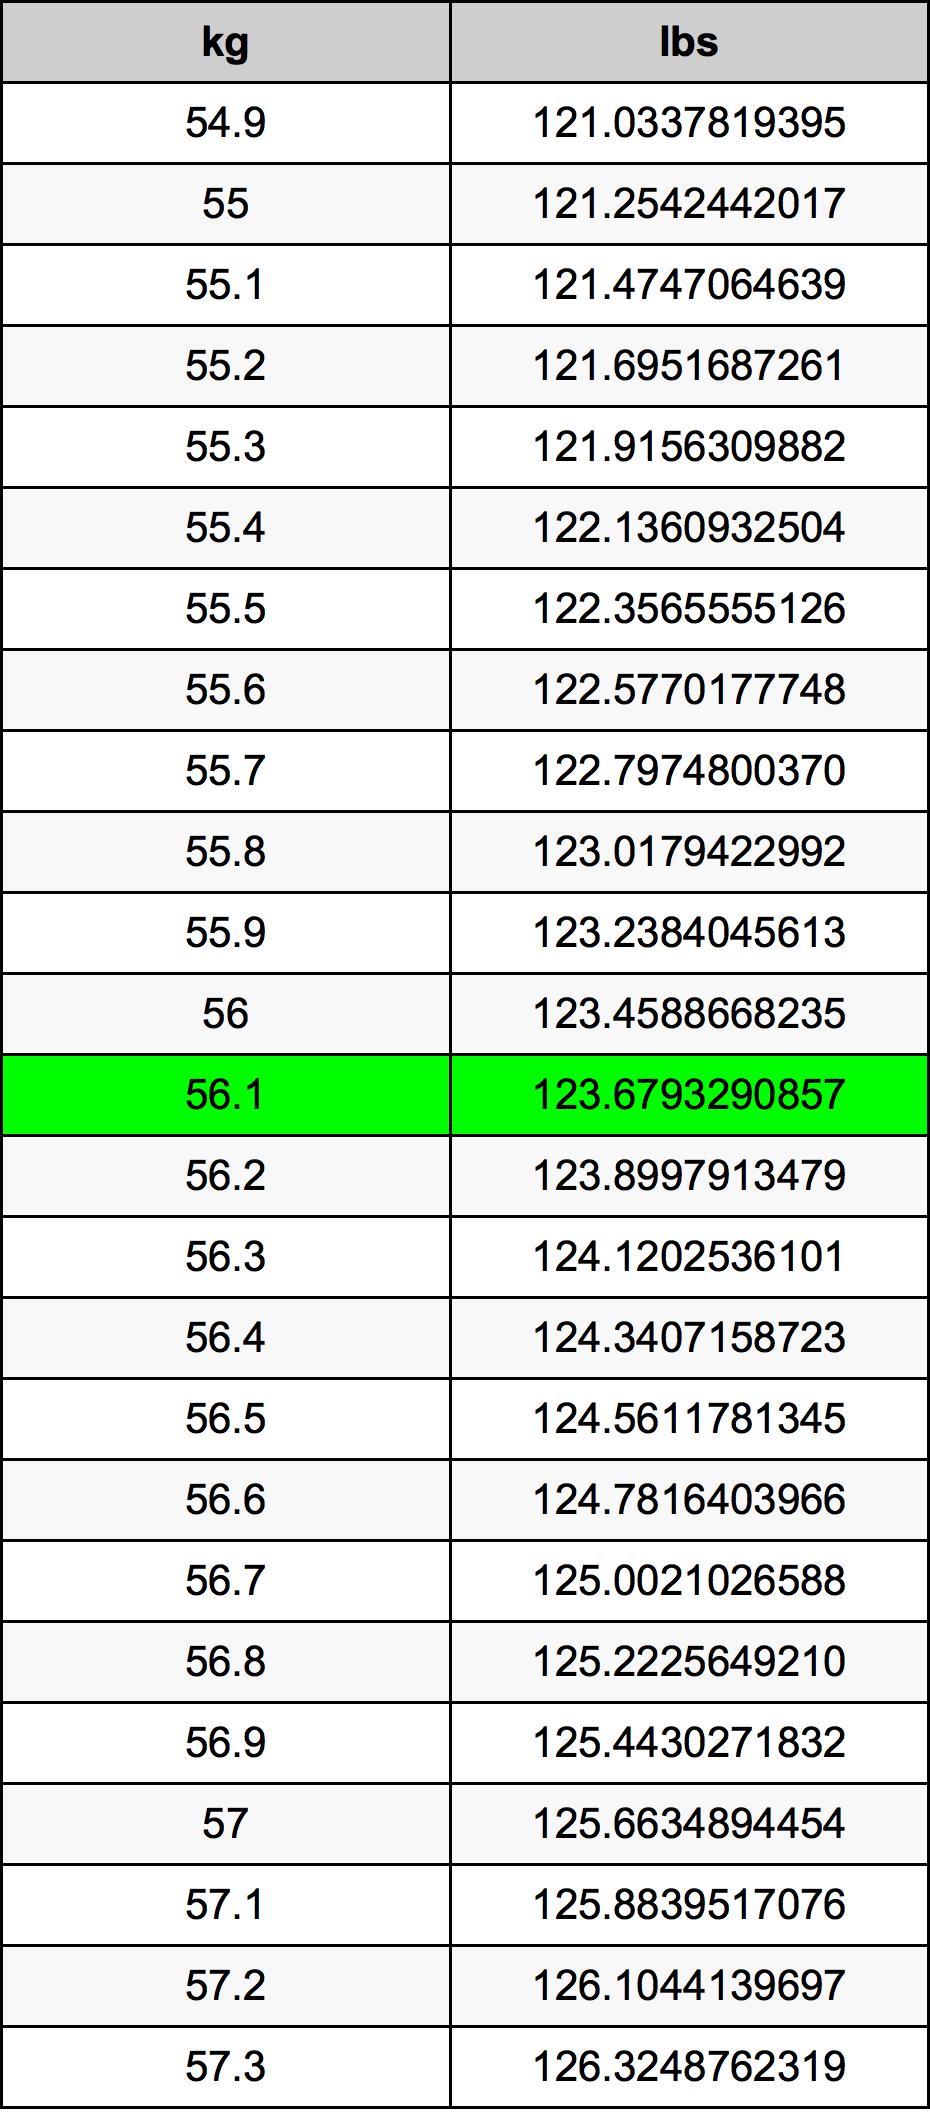 56.1 Kilogrami Table